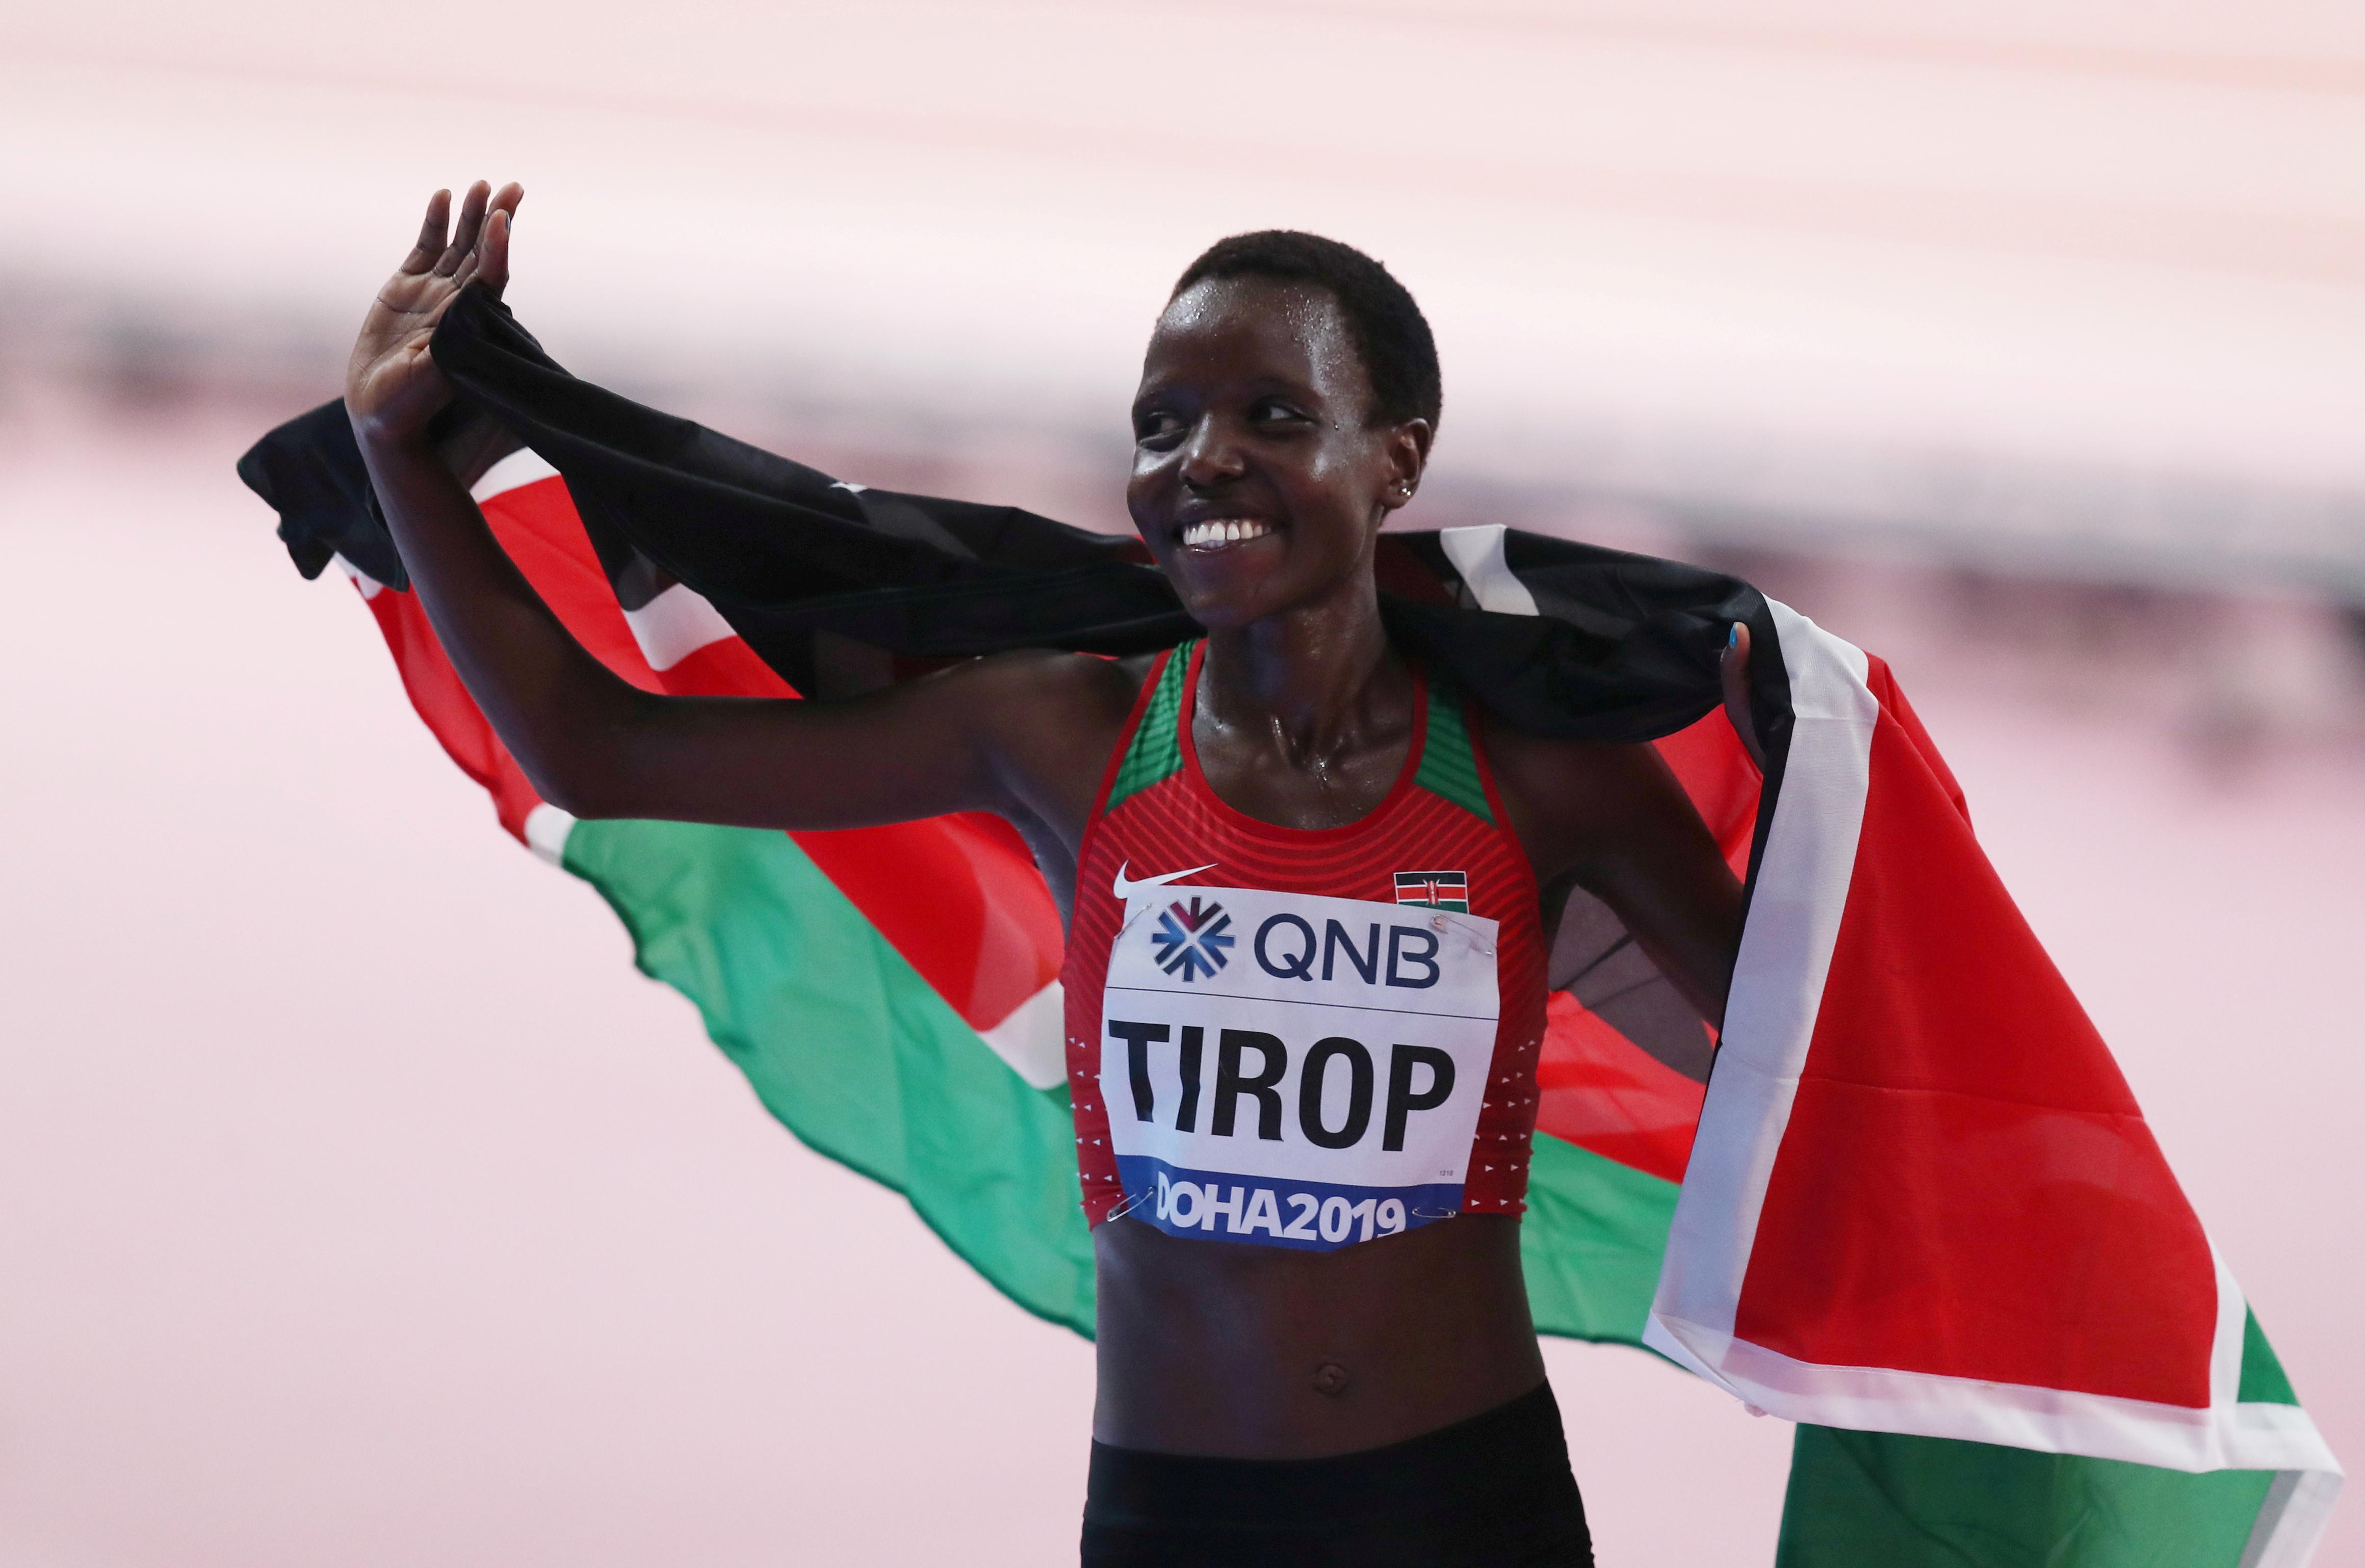 Kenya's Agnes Jebet Tirop reacts after finishing third in the final REUTERS/Ibraheem Al Omari/File Photo